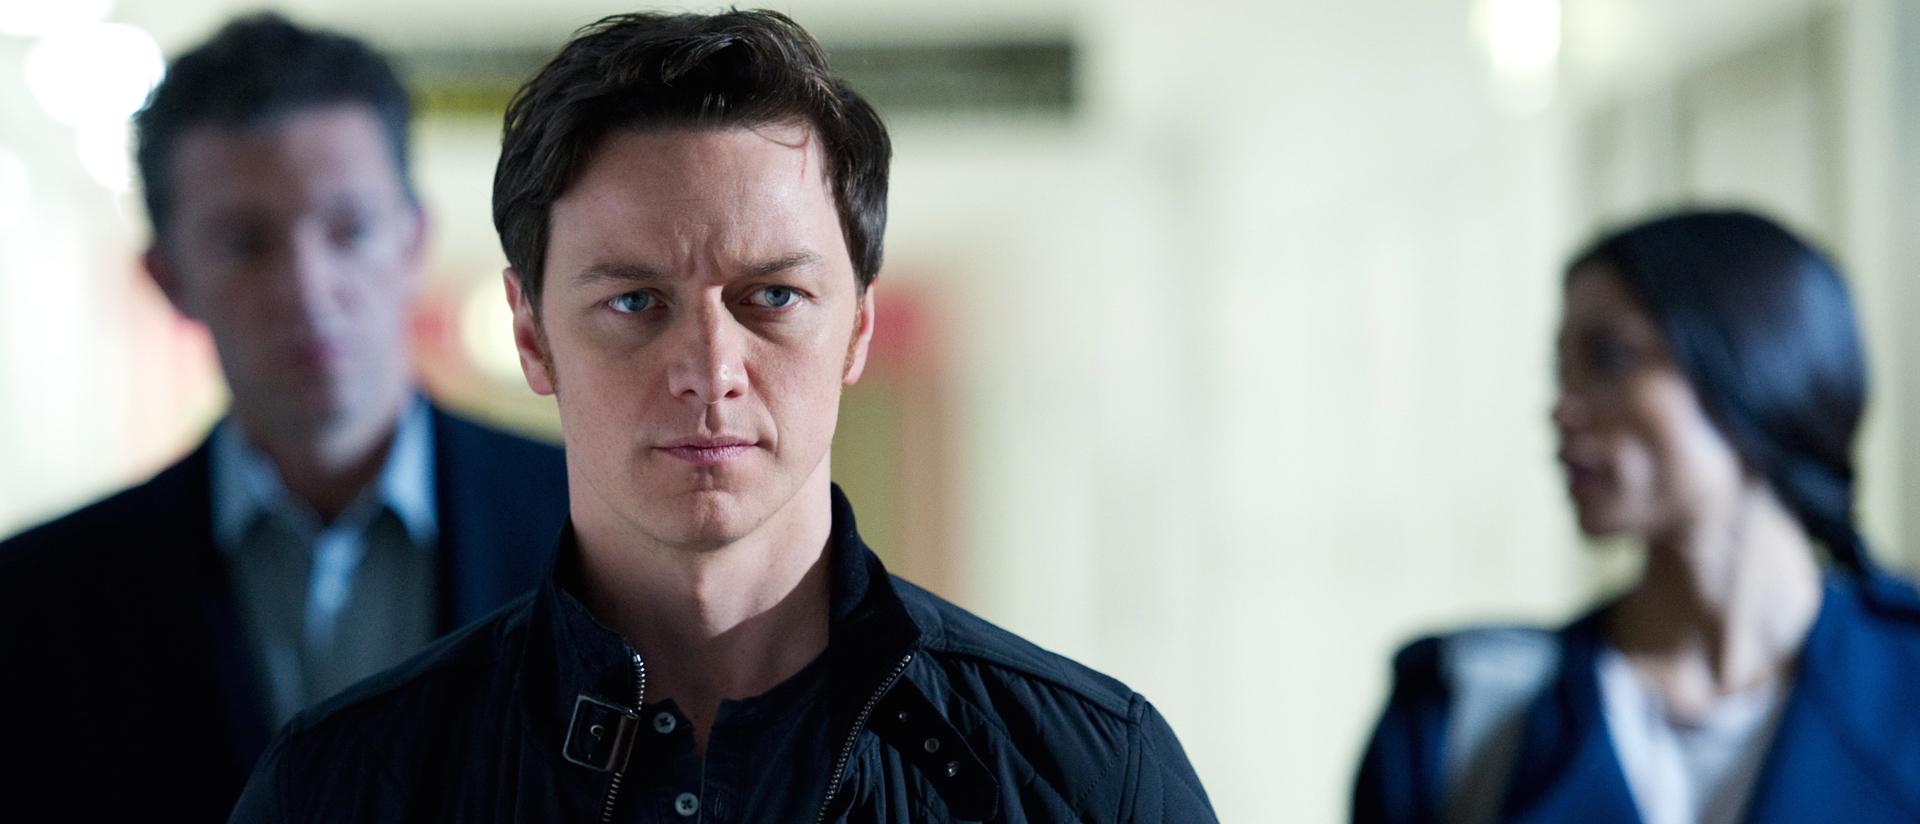 James McAvoy to Star in M Night Shyamalan's Next Movie